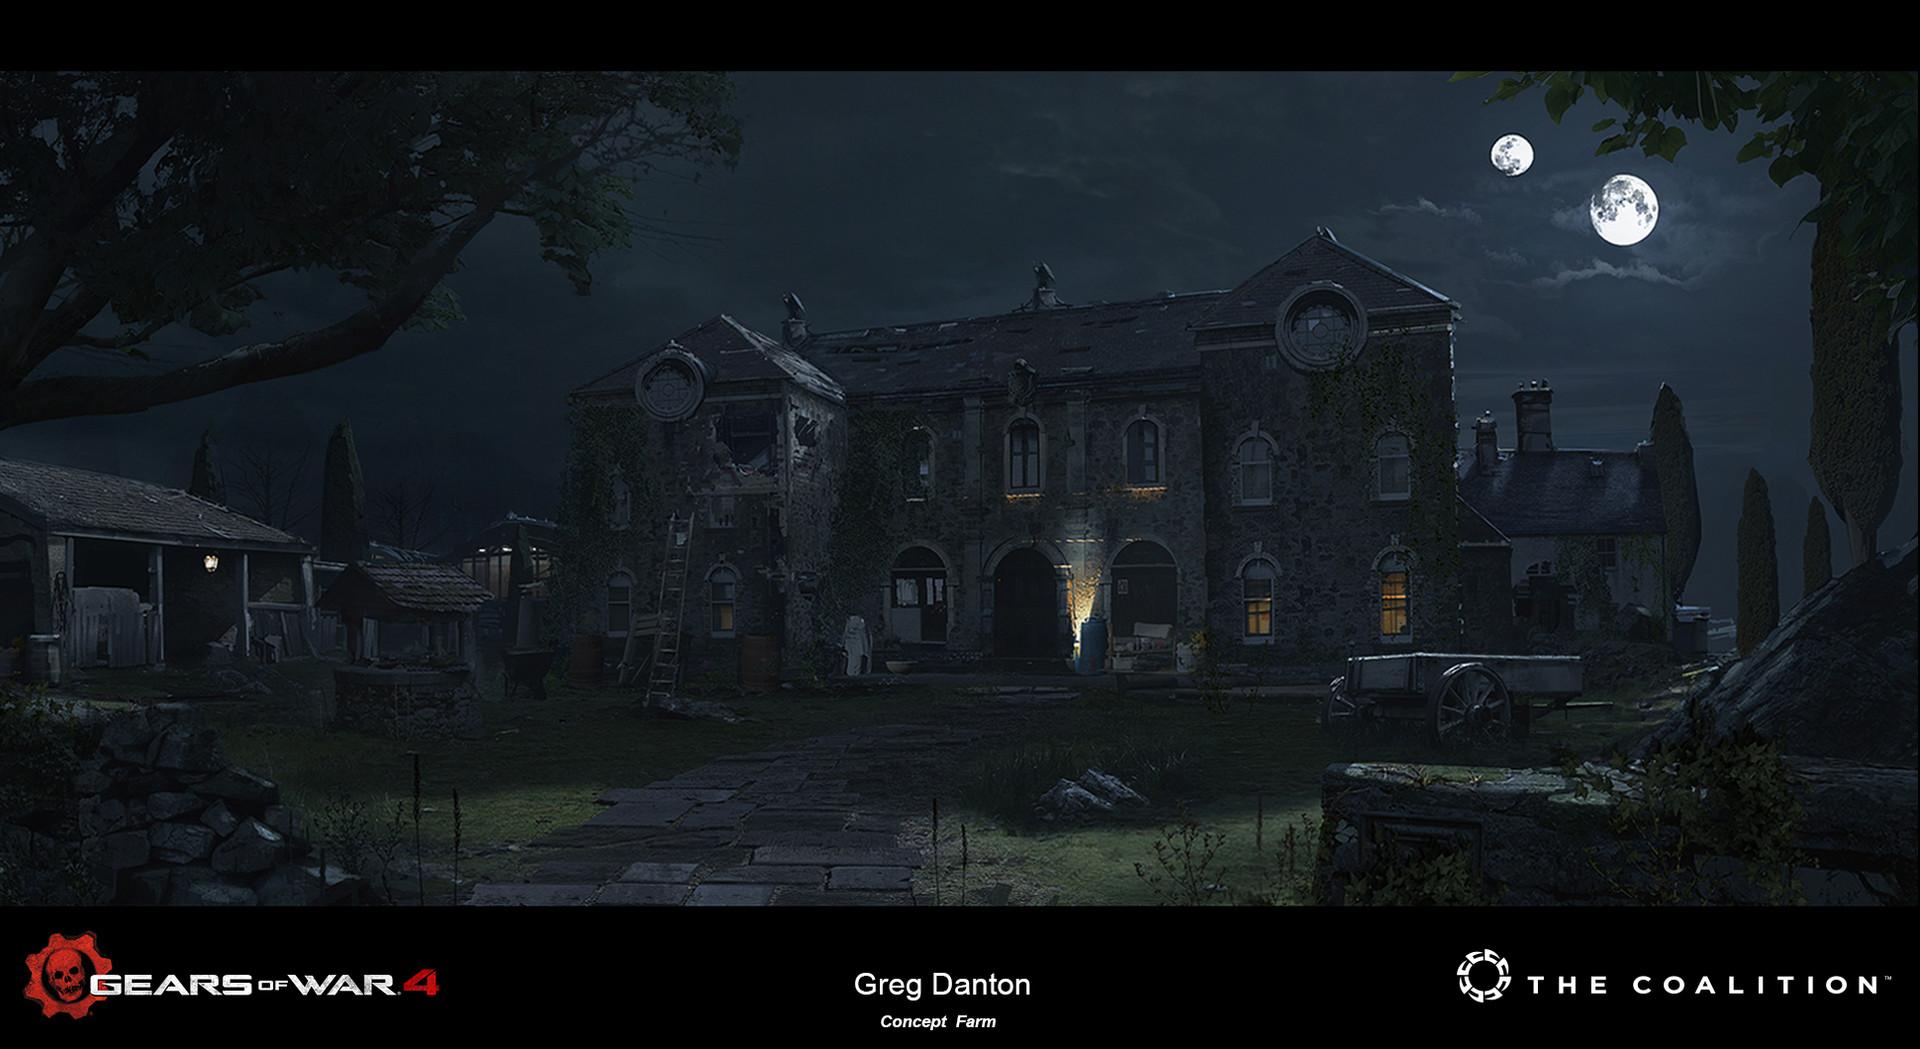 Greg danton art 26